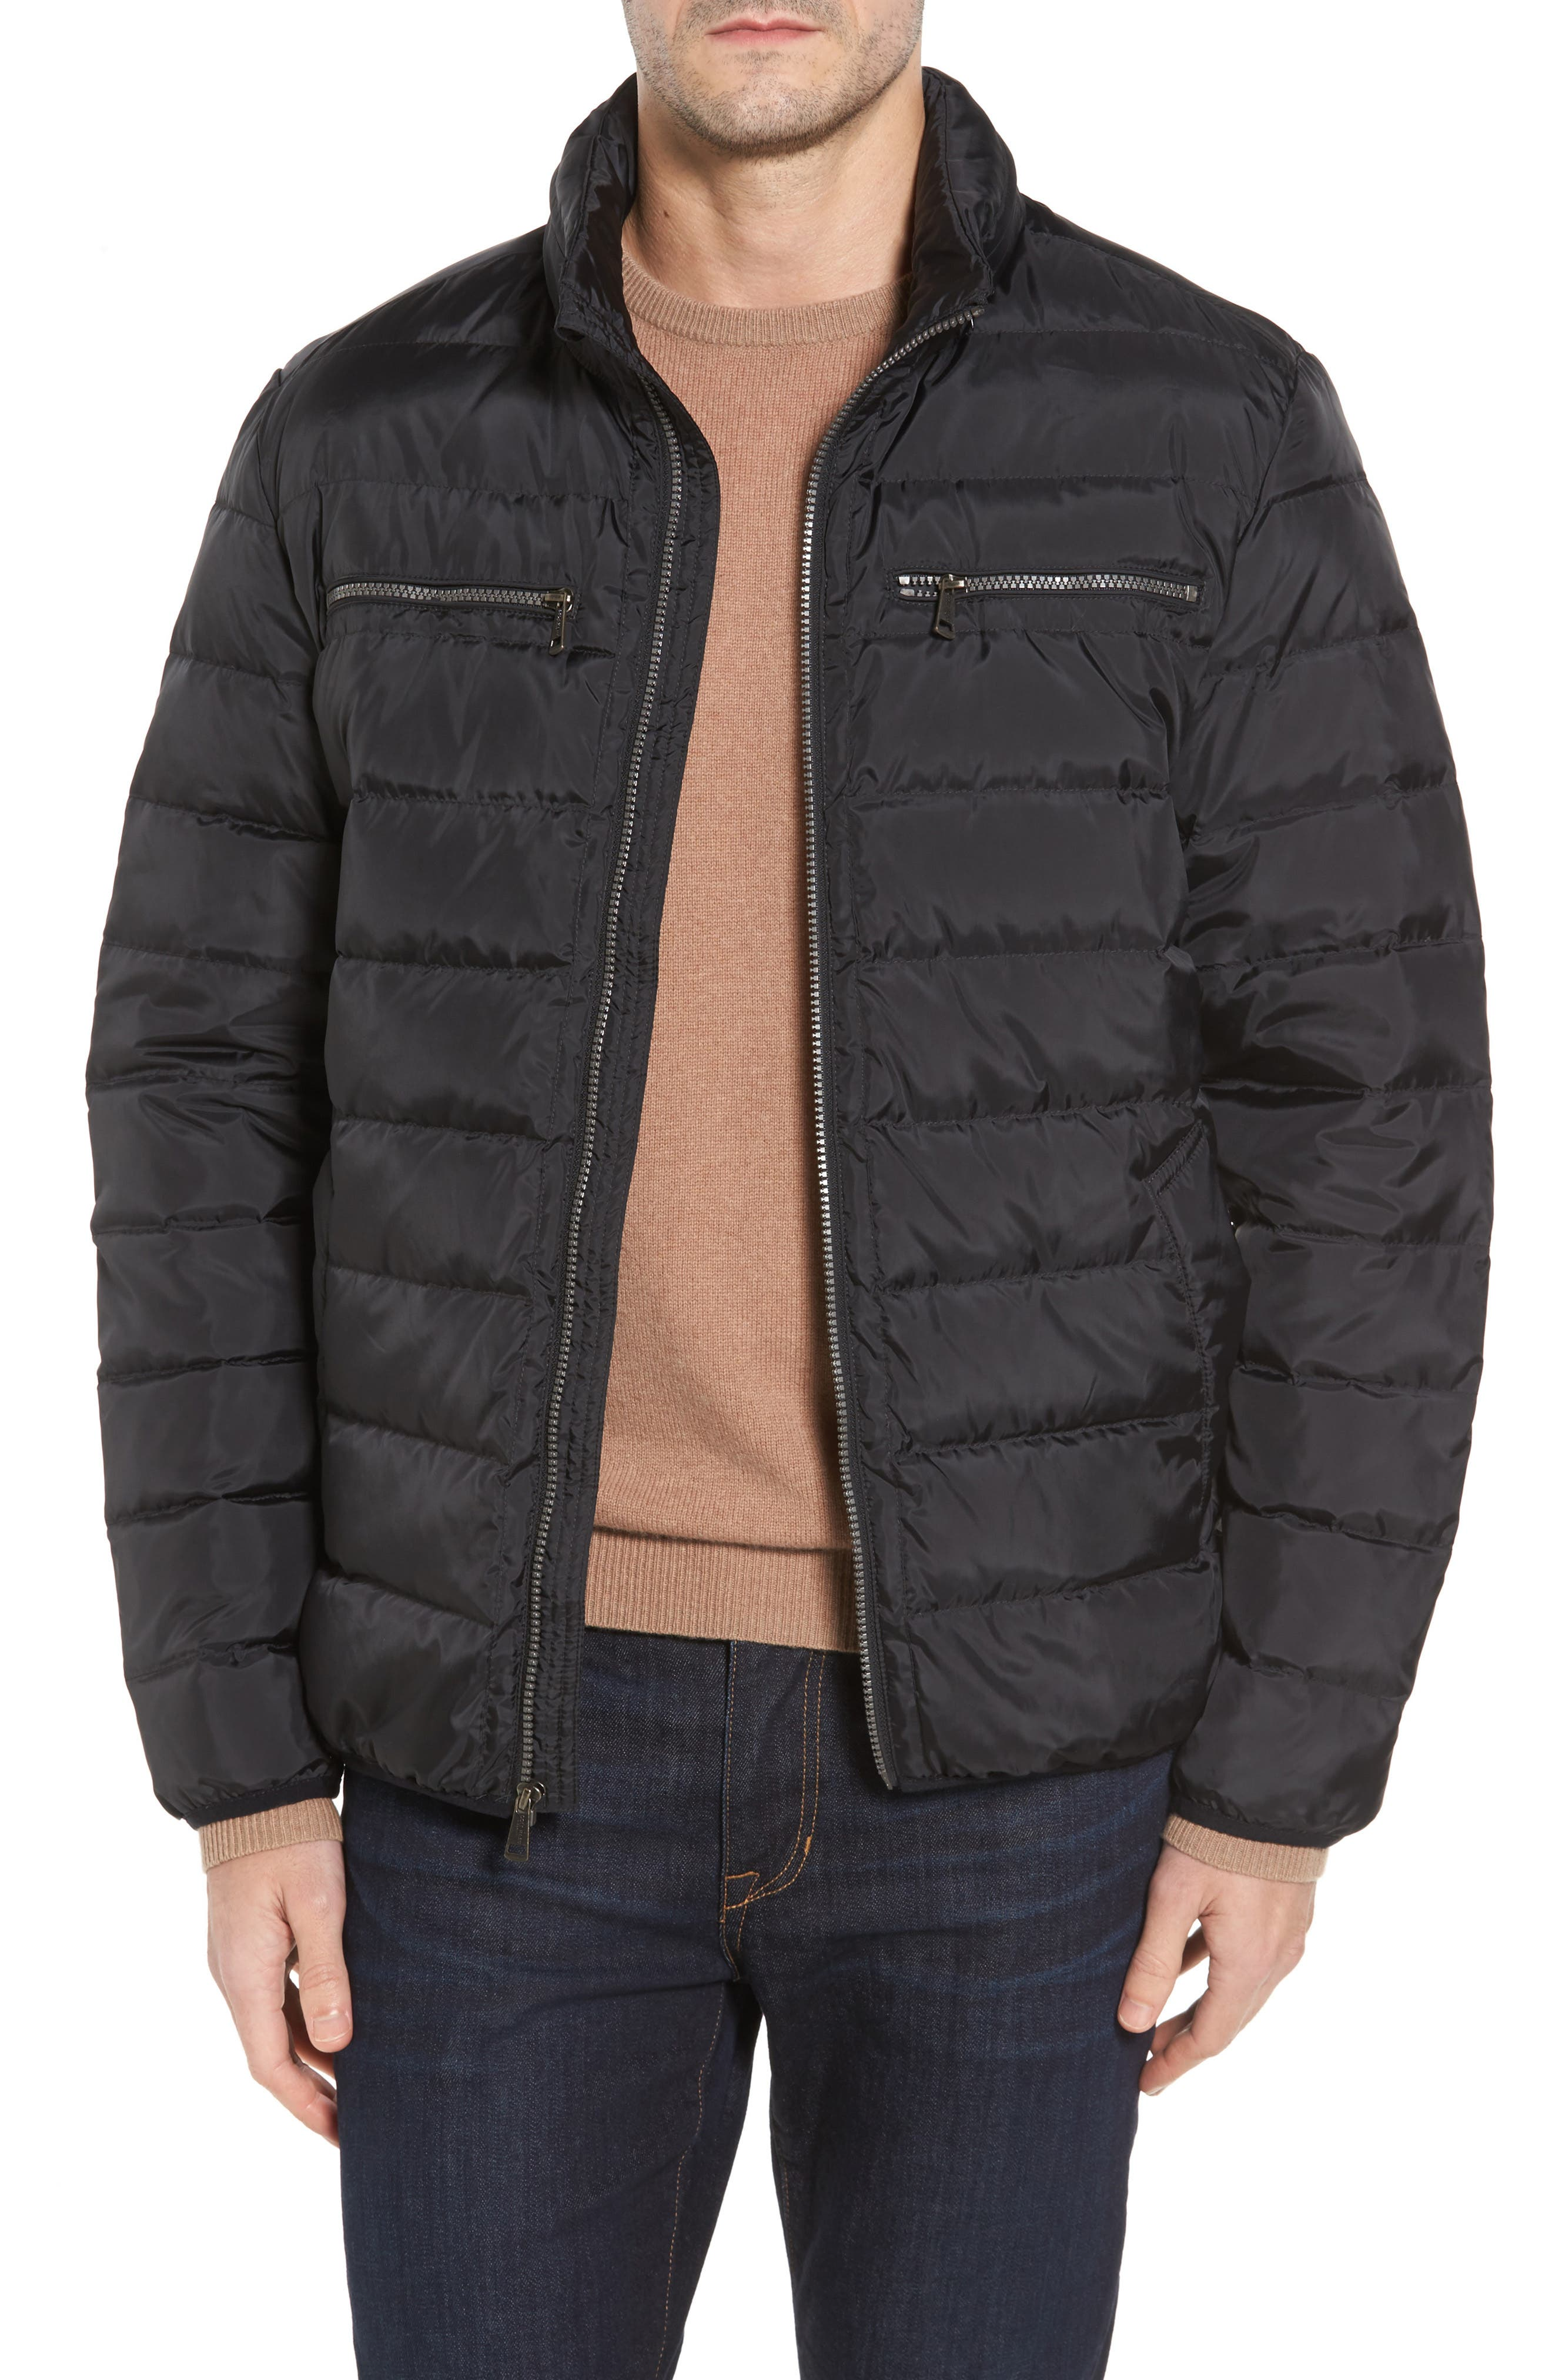 Cole Haan Packable Down Jacket, Black